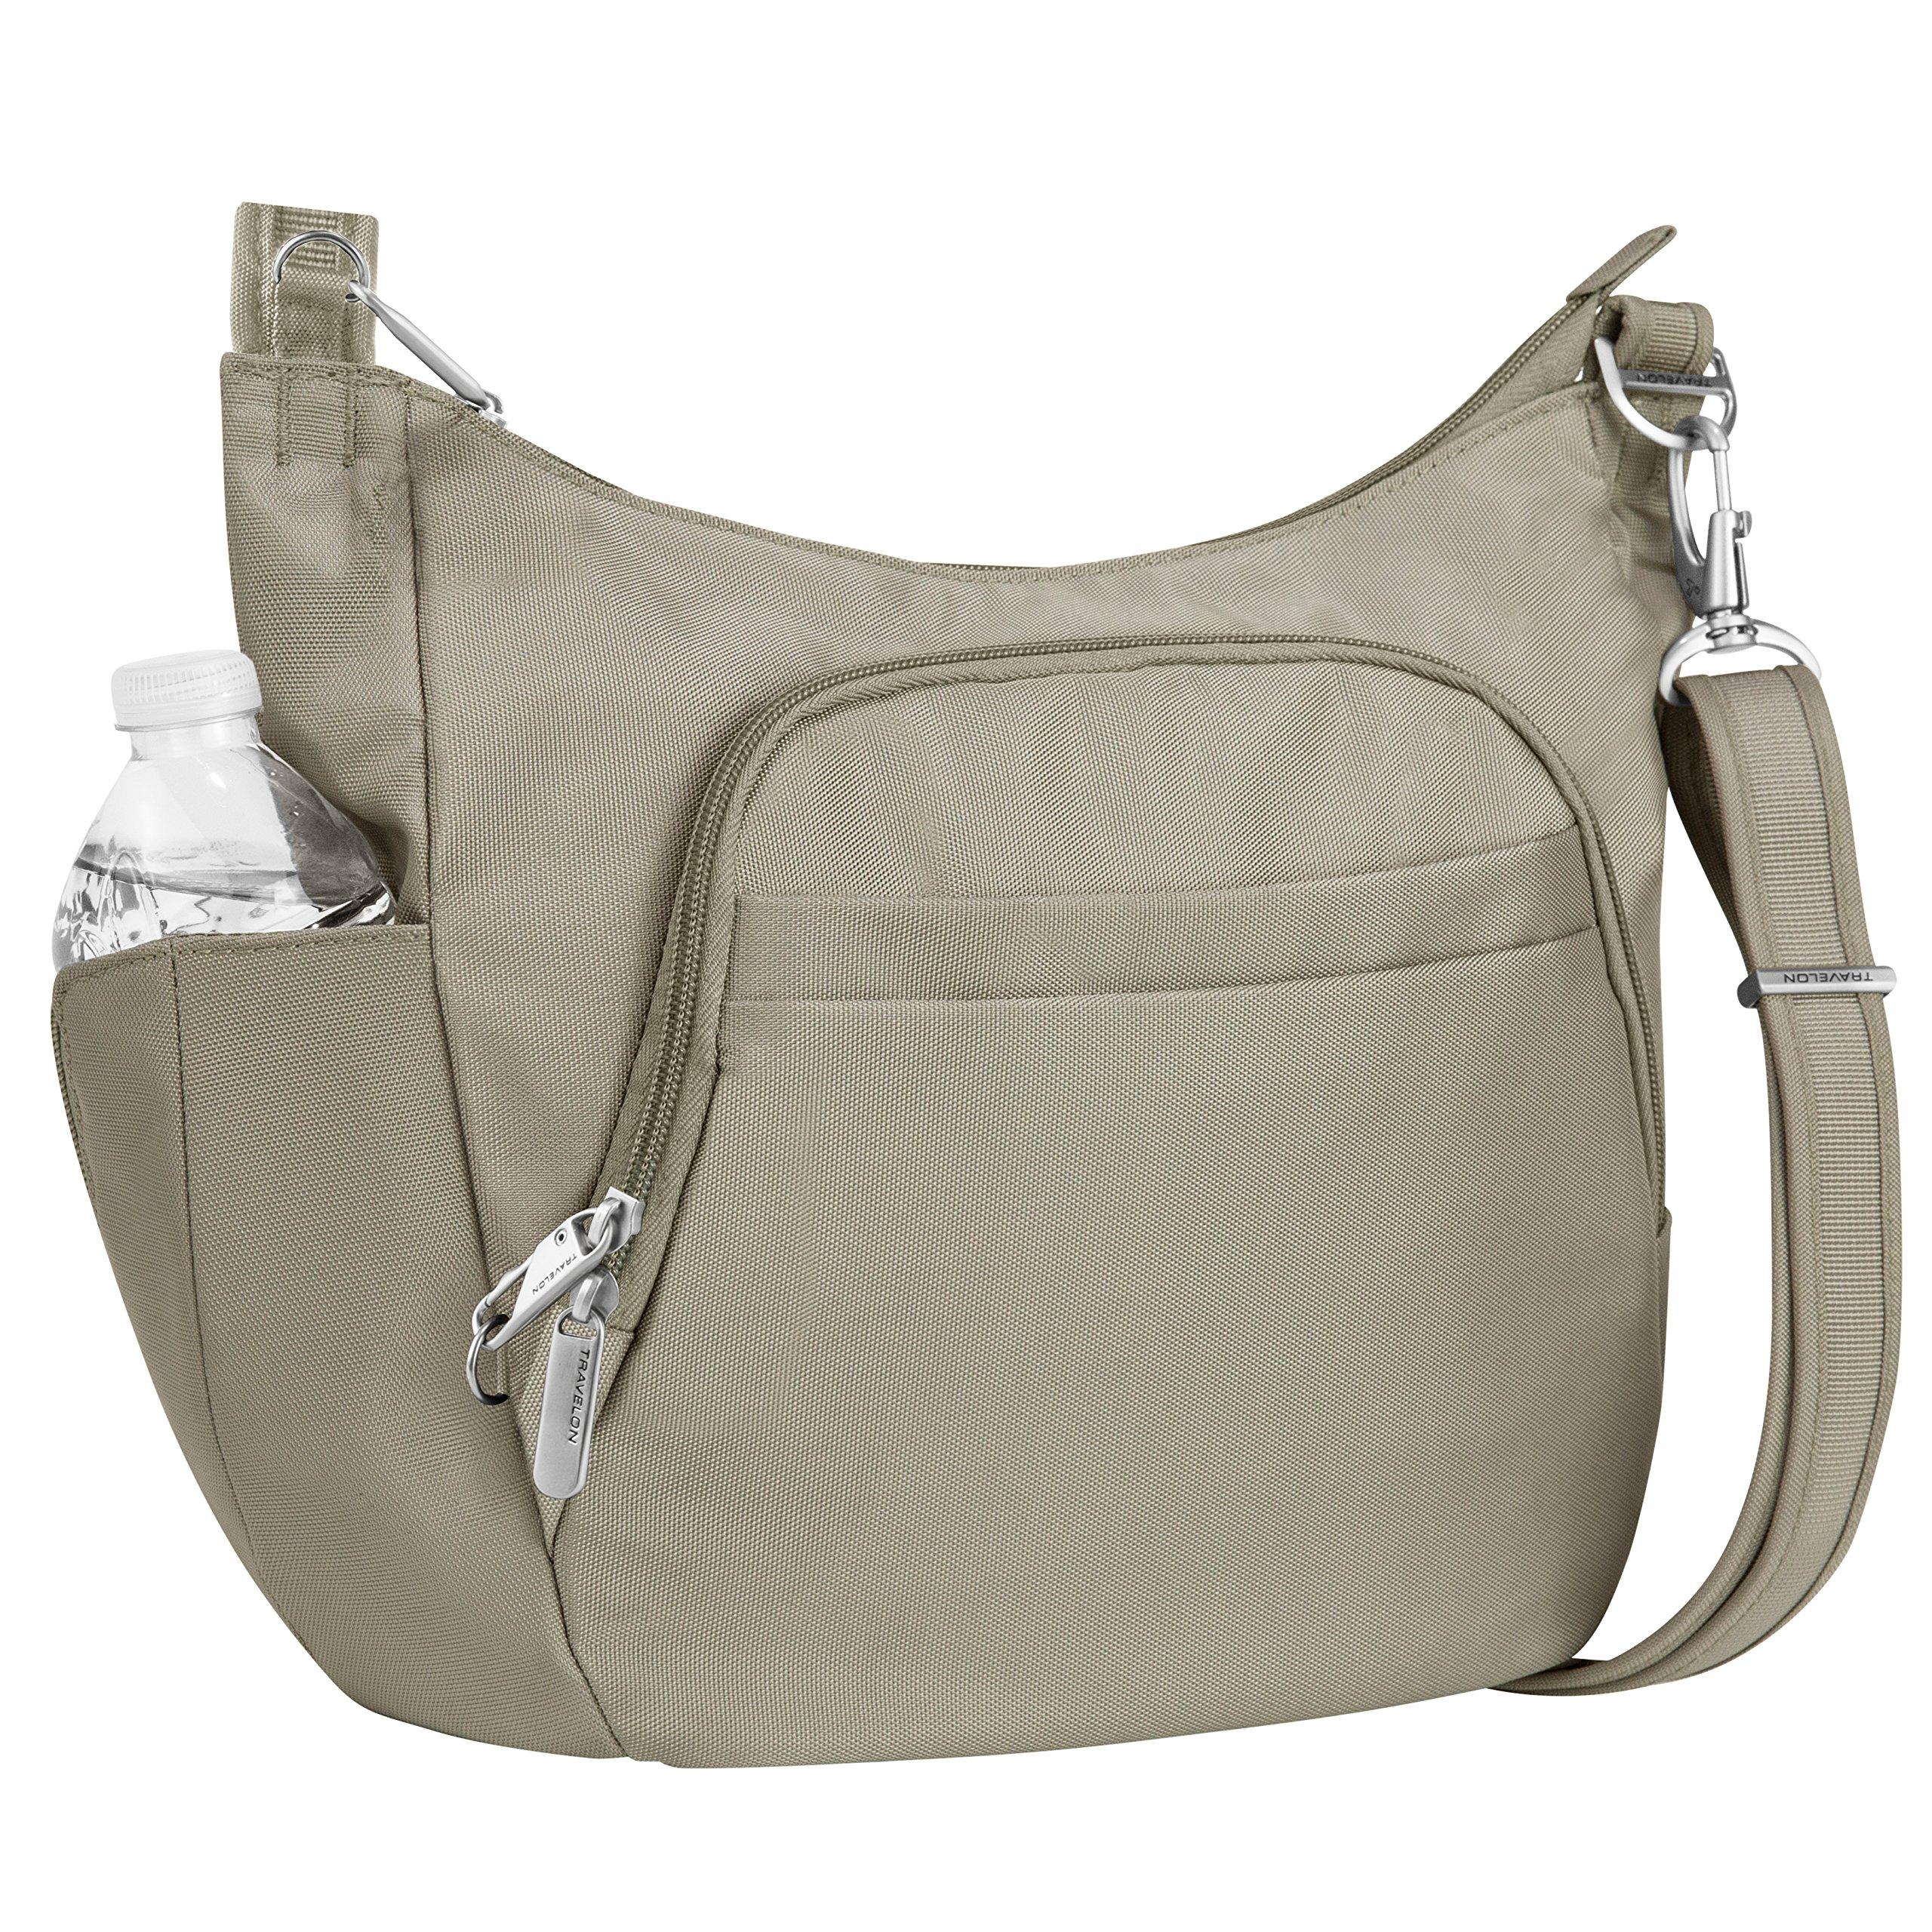 Travelon Anti-Theft Cross-Body Bucket Bag, Stone, One Size